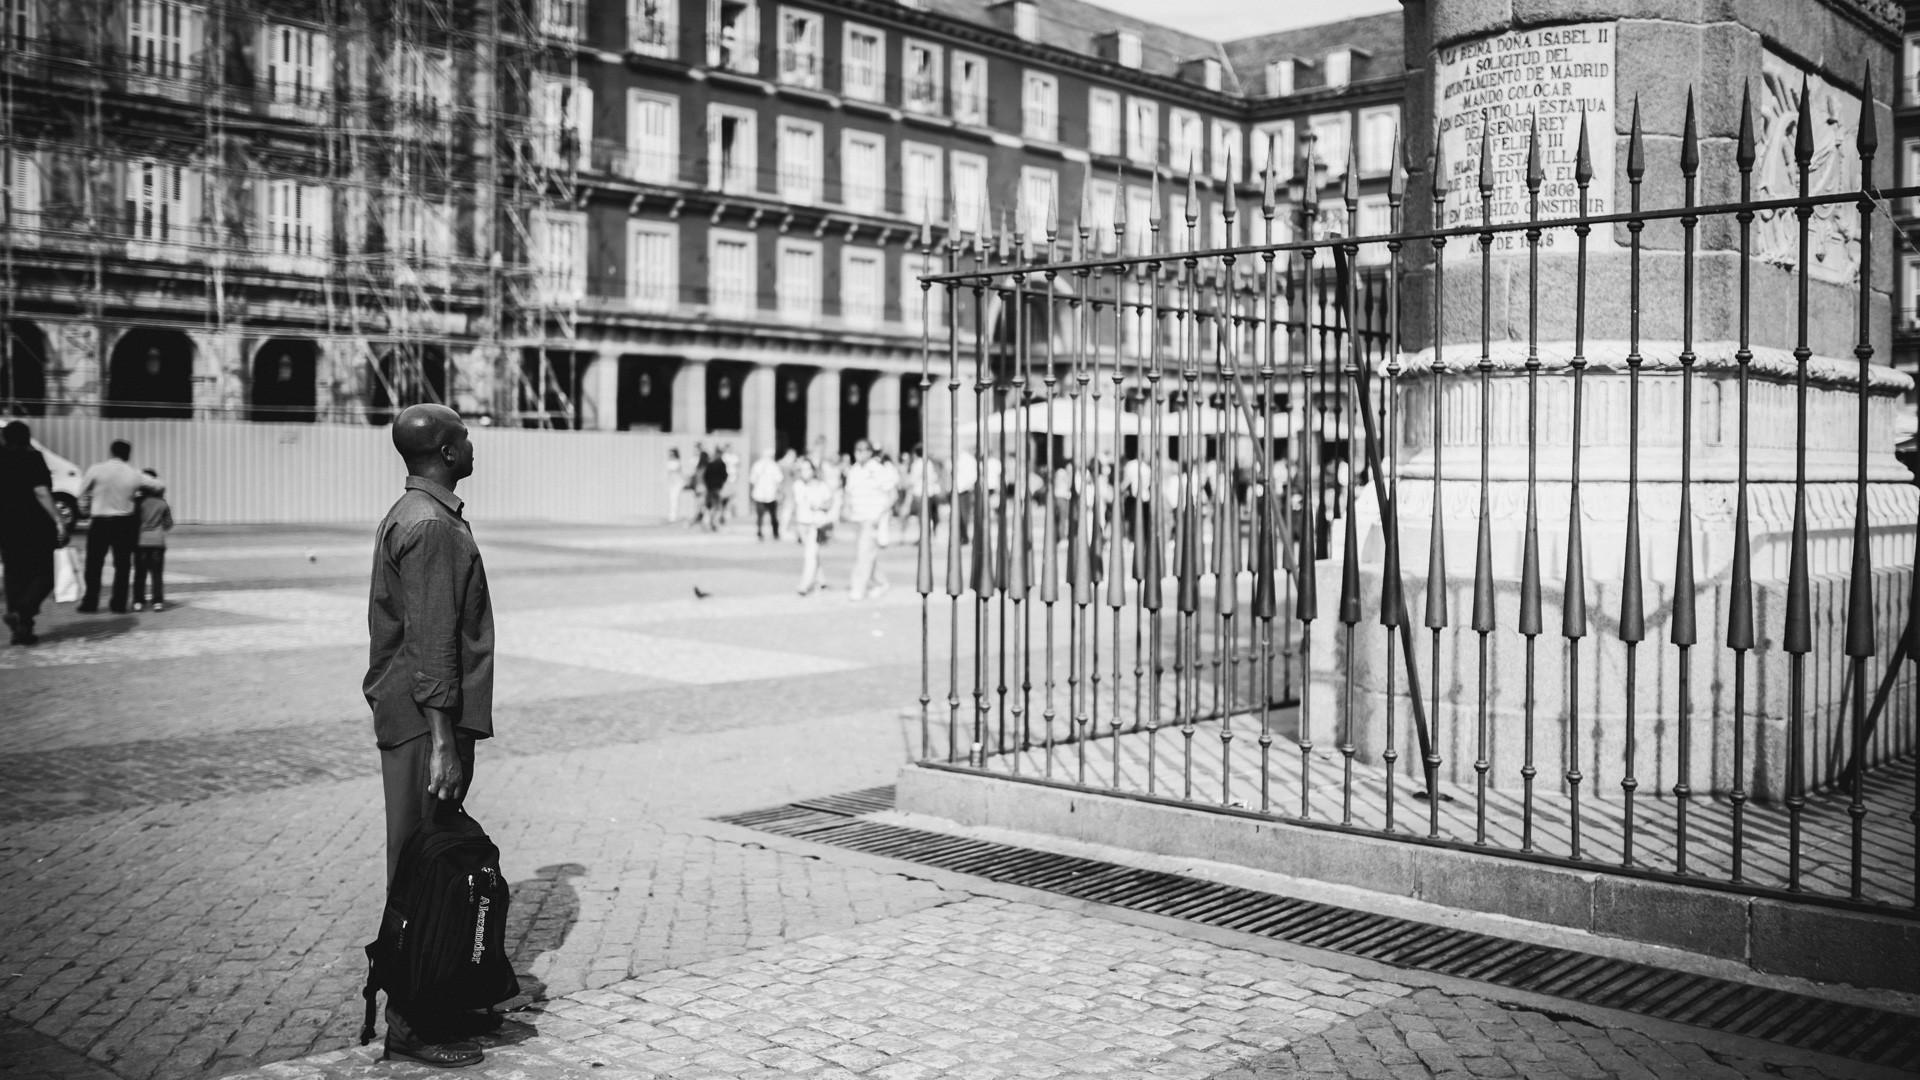 Damien-Dohmen-Photographe-Madrid-12